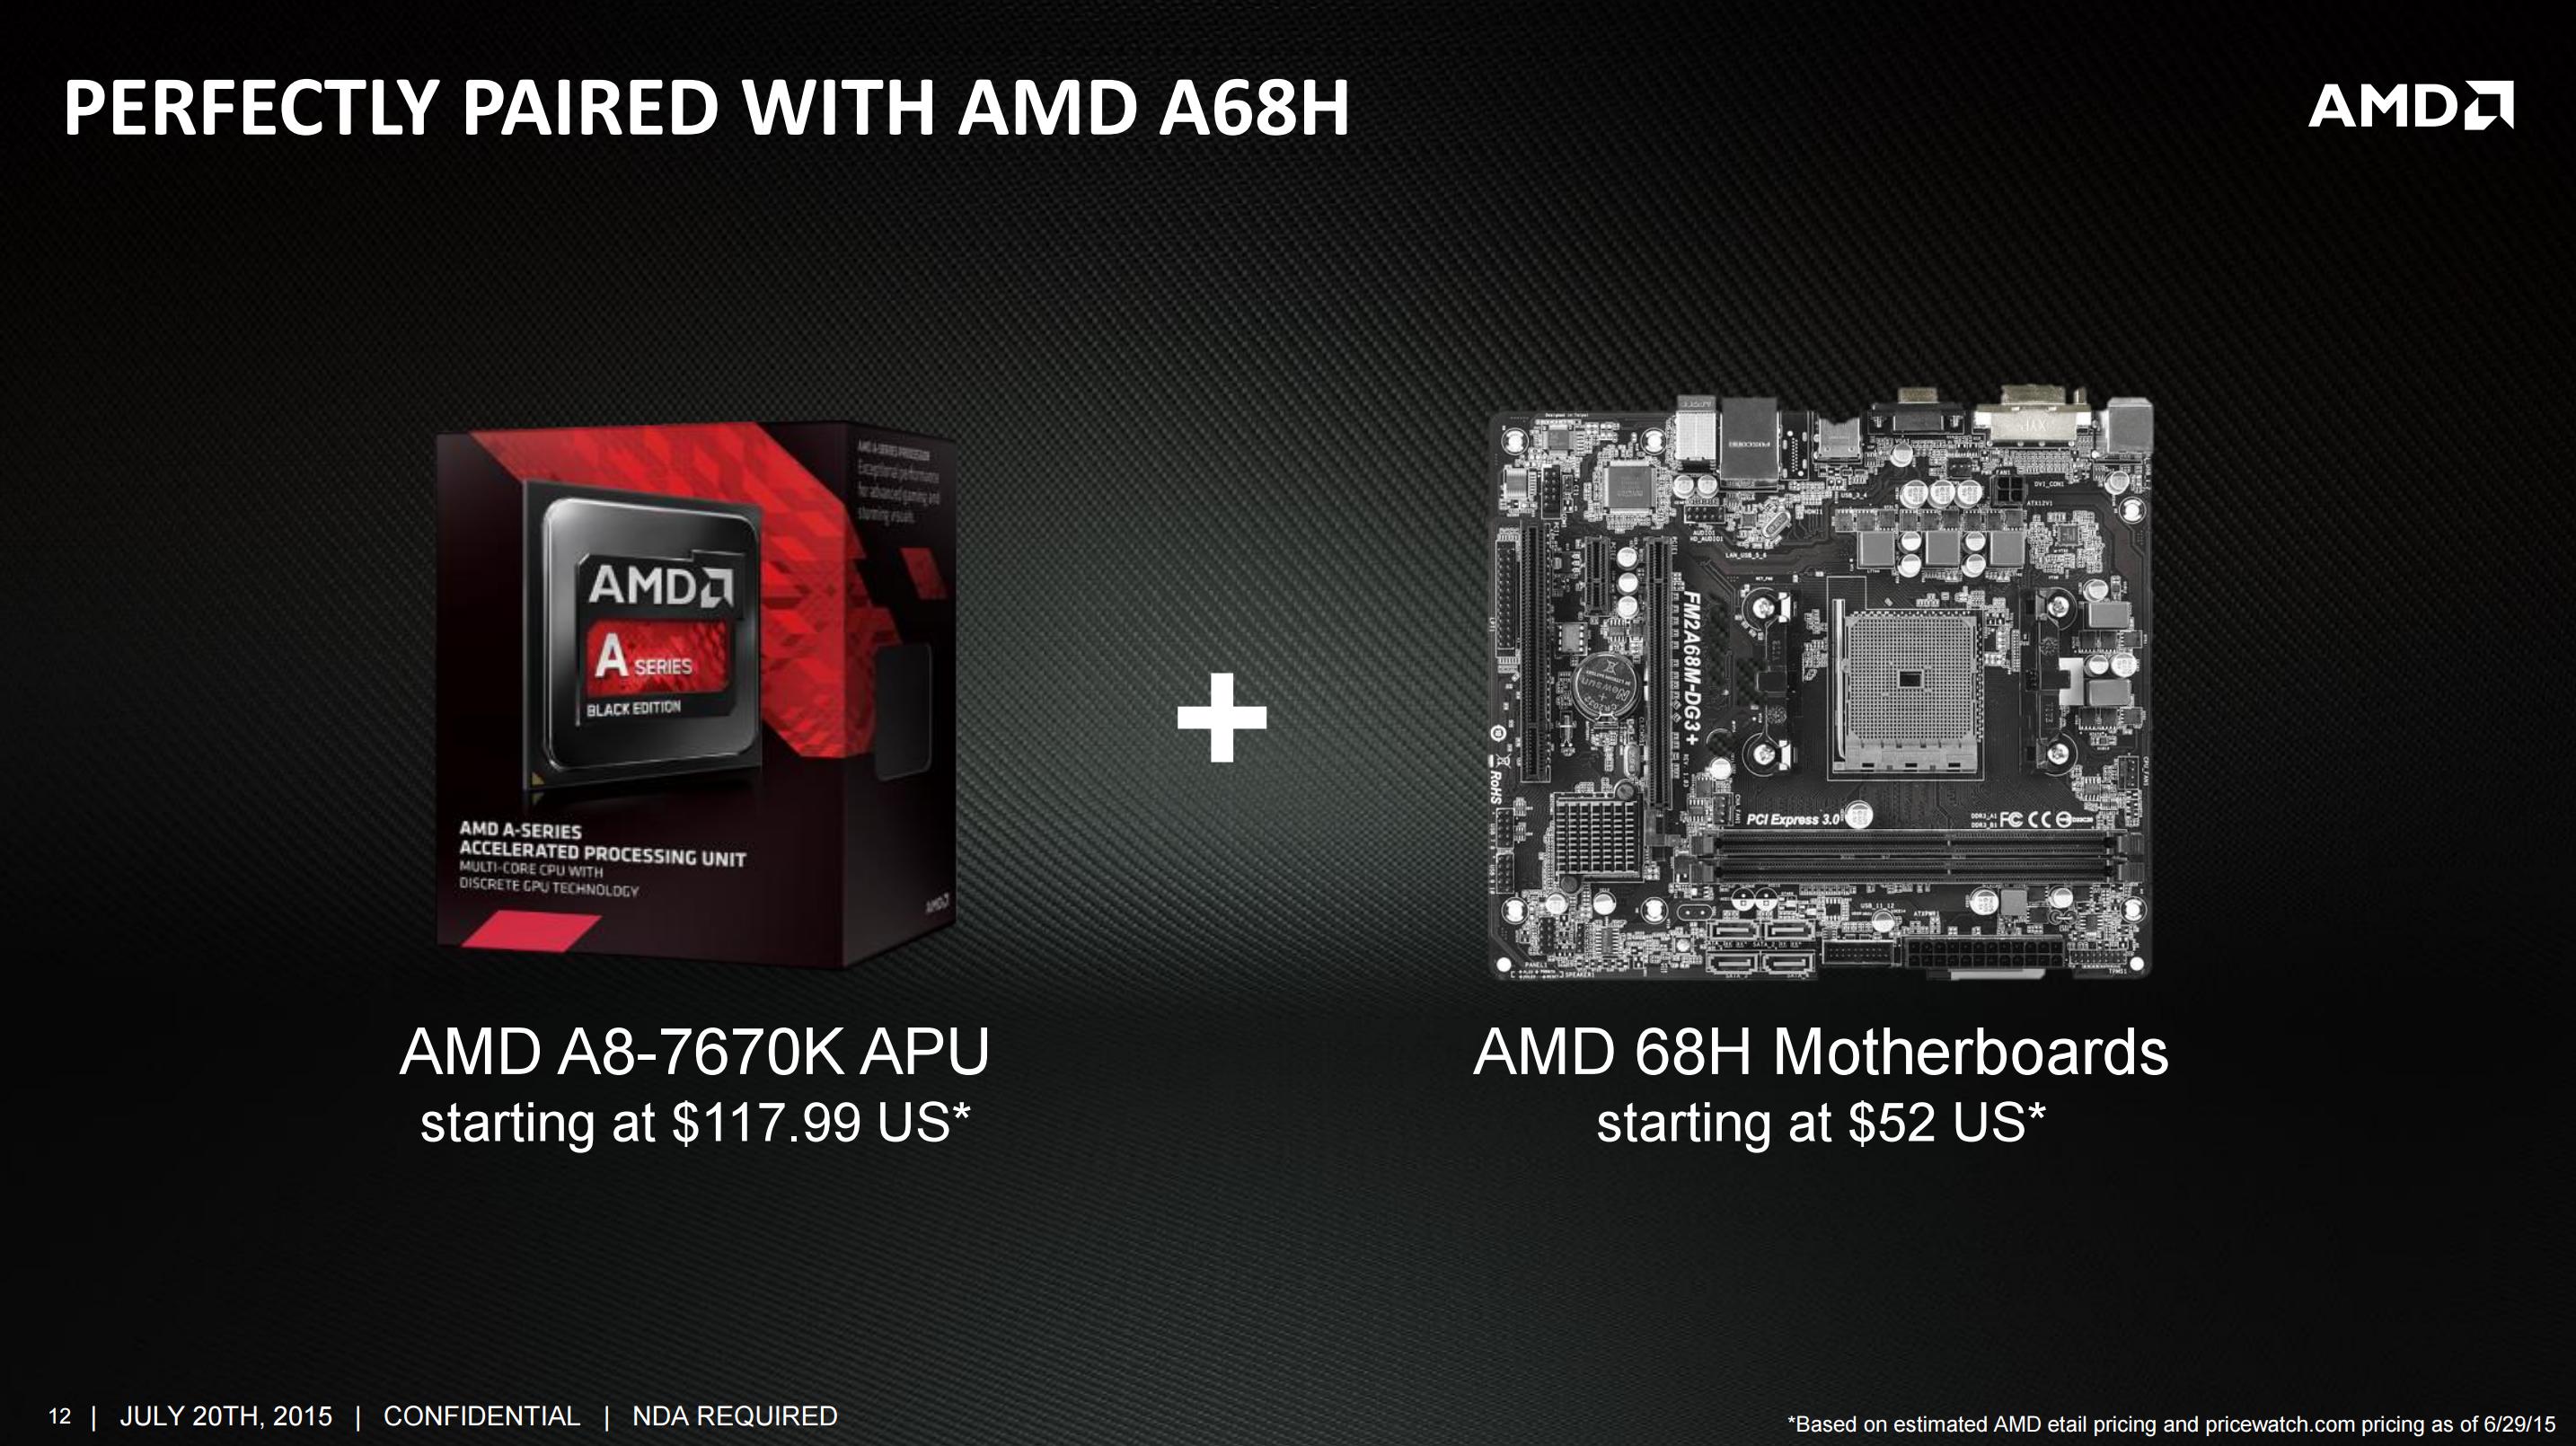 Processor Amd Socket Fm2 A8 7600 Box7 Daftar Harga Terkini Box 7650k Kaveri Quad Core 33 Ghz 95w 7670k Conclusion The Apu Review Aiming For